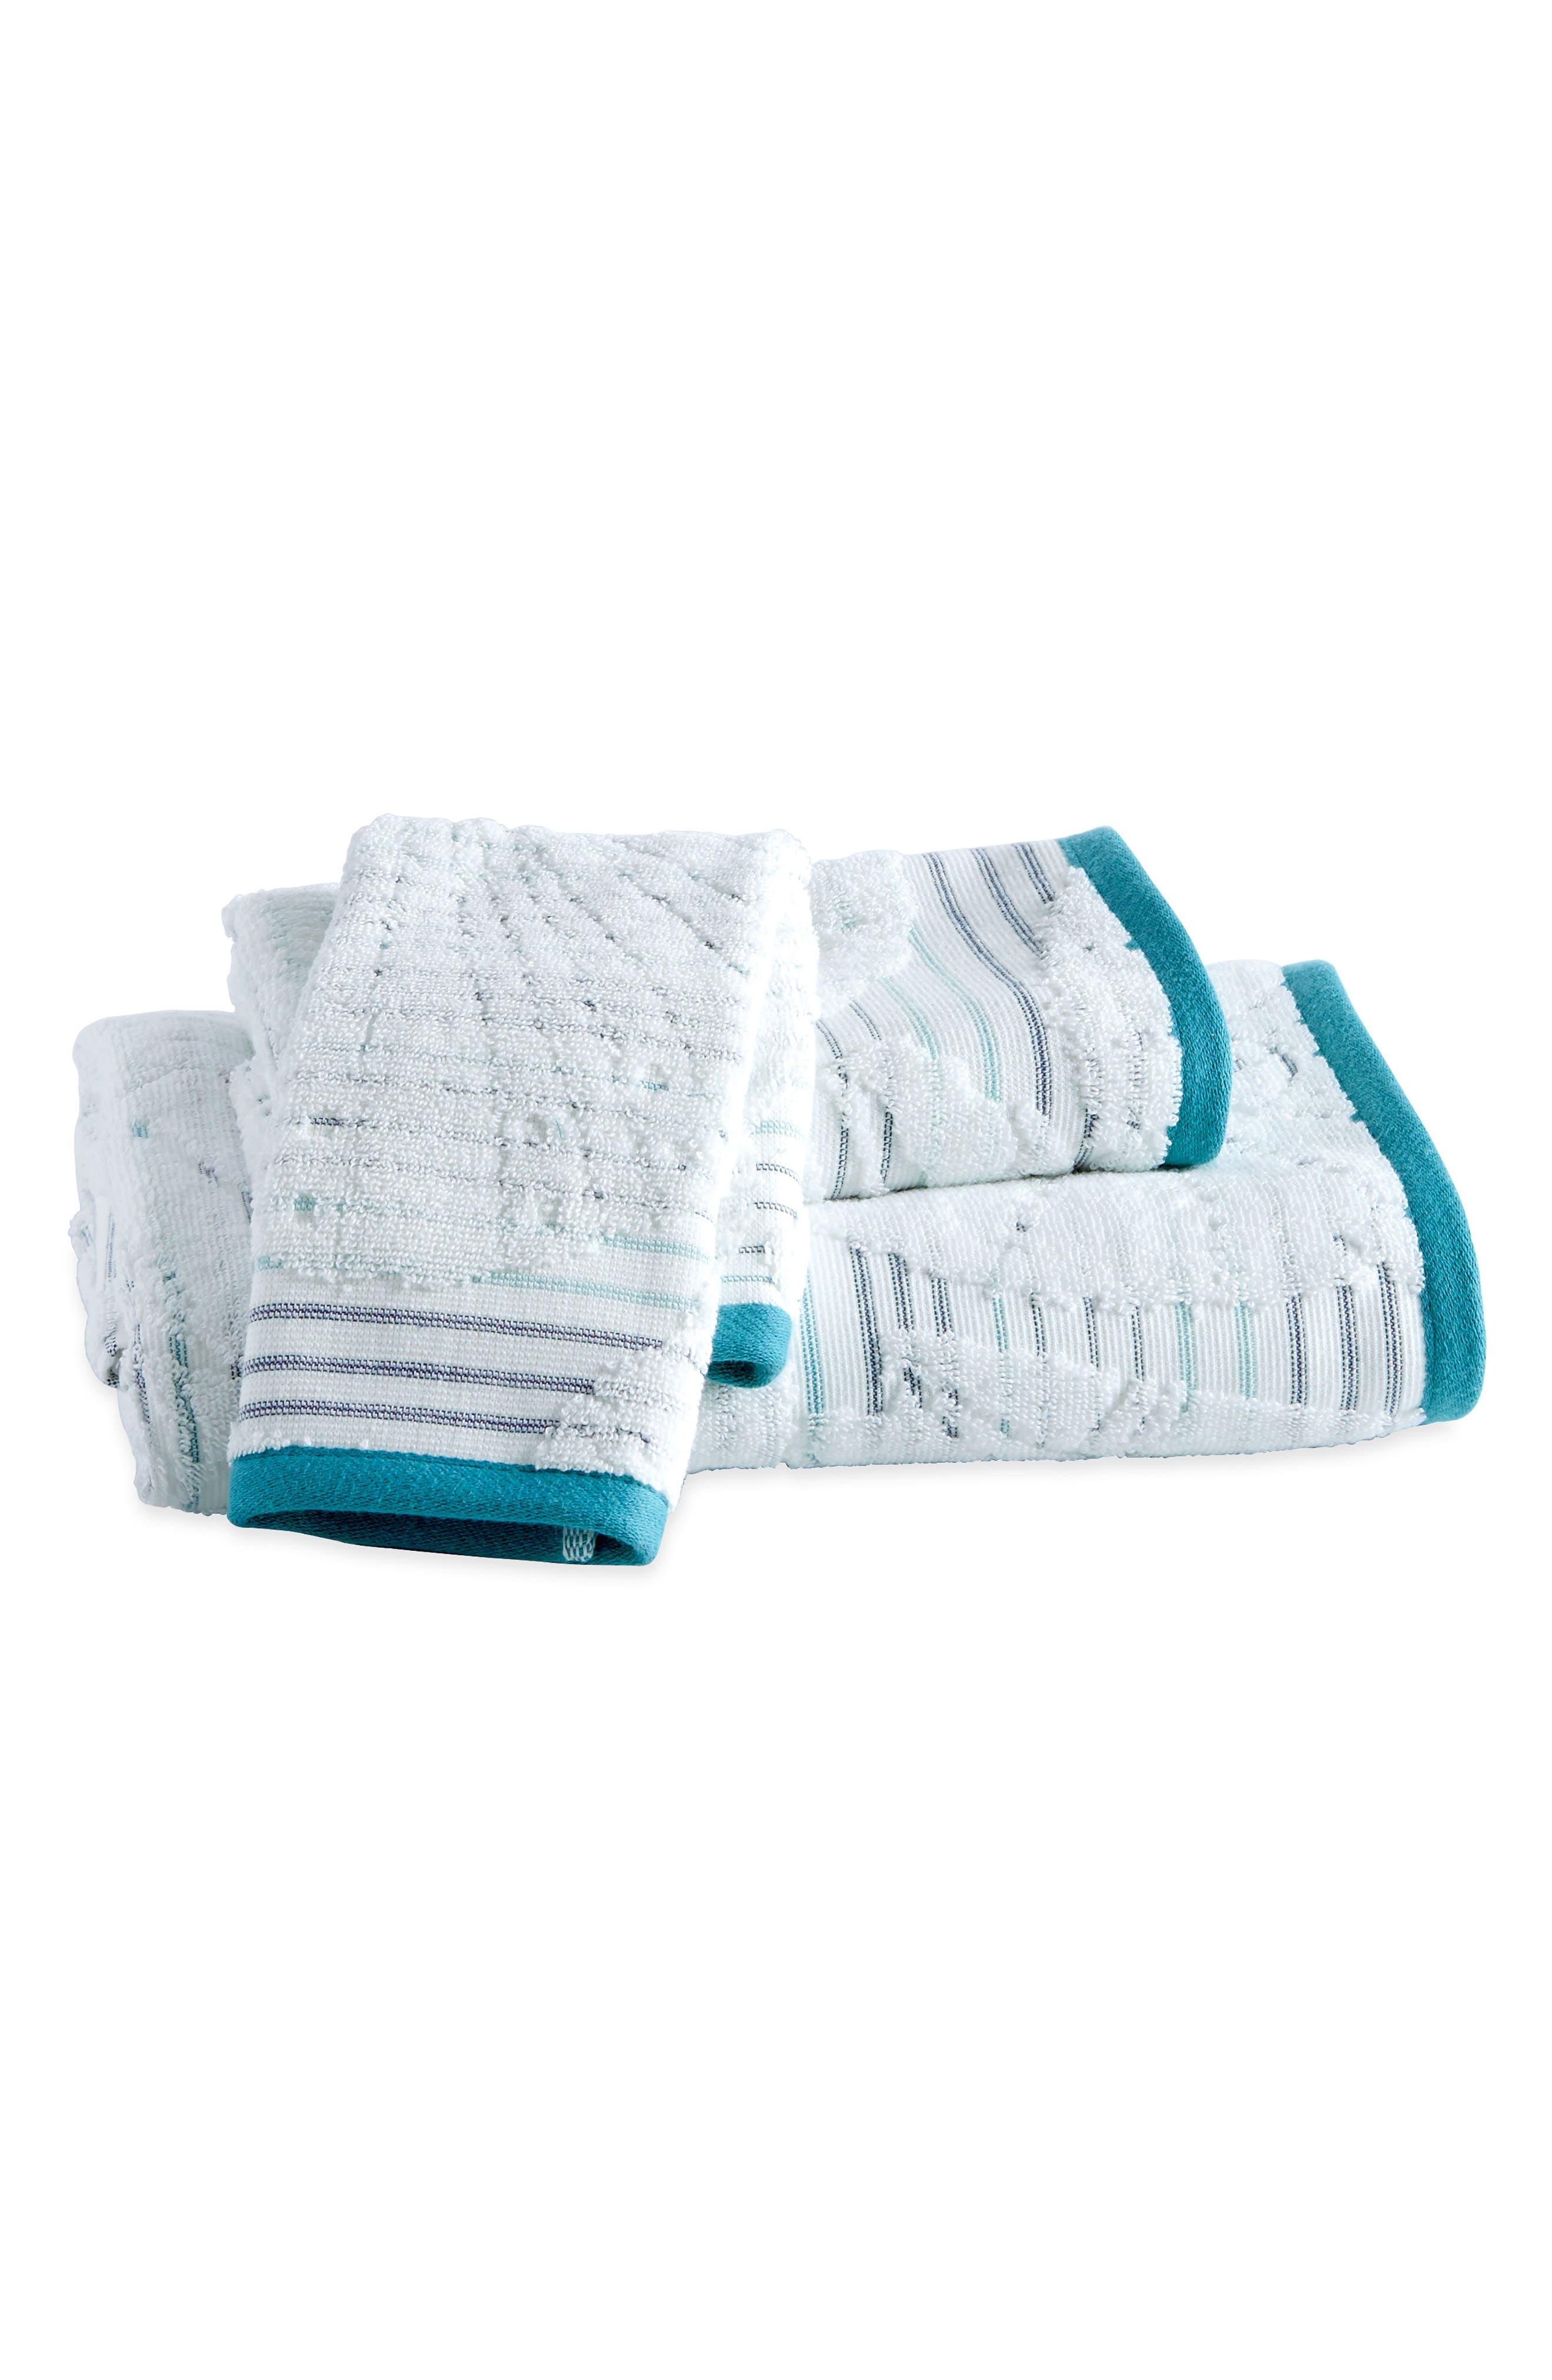 Mykonos Bath Towel, Hand Towel and Washcloth Set,                             Main thumbnail 1, color,                             400